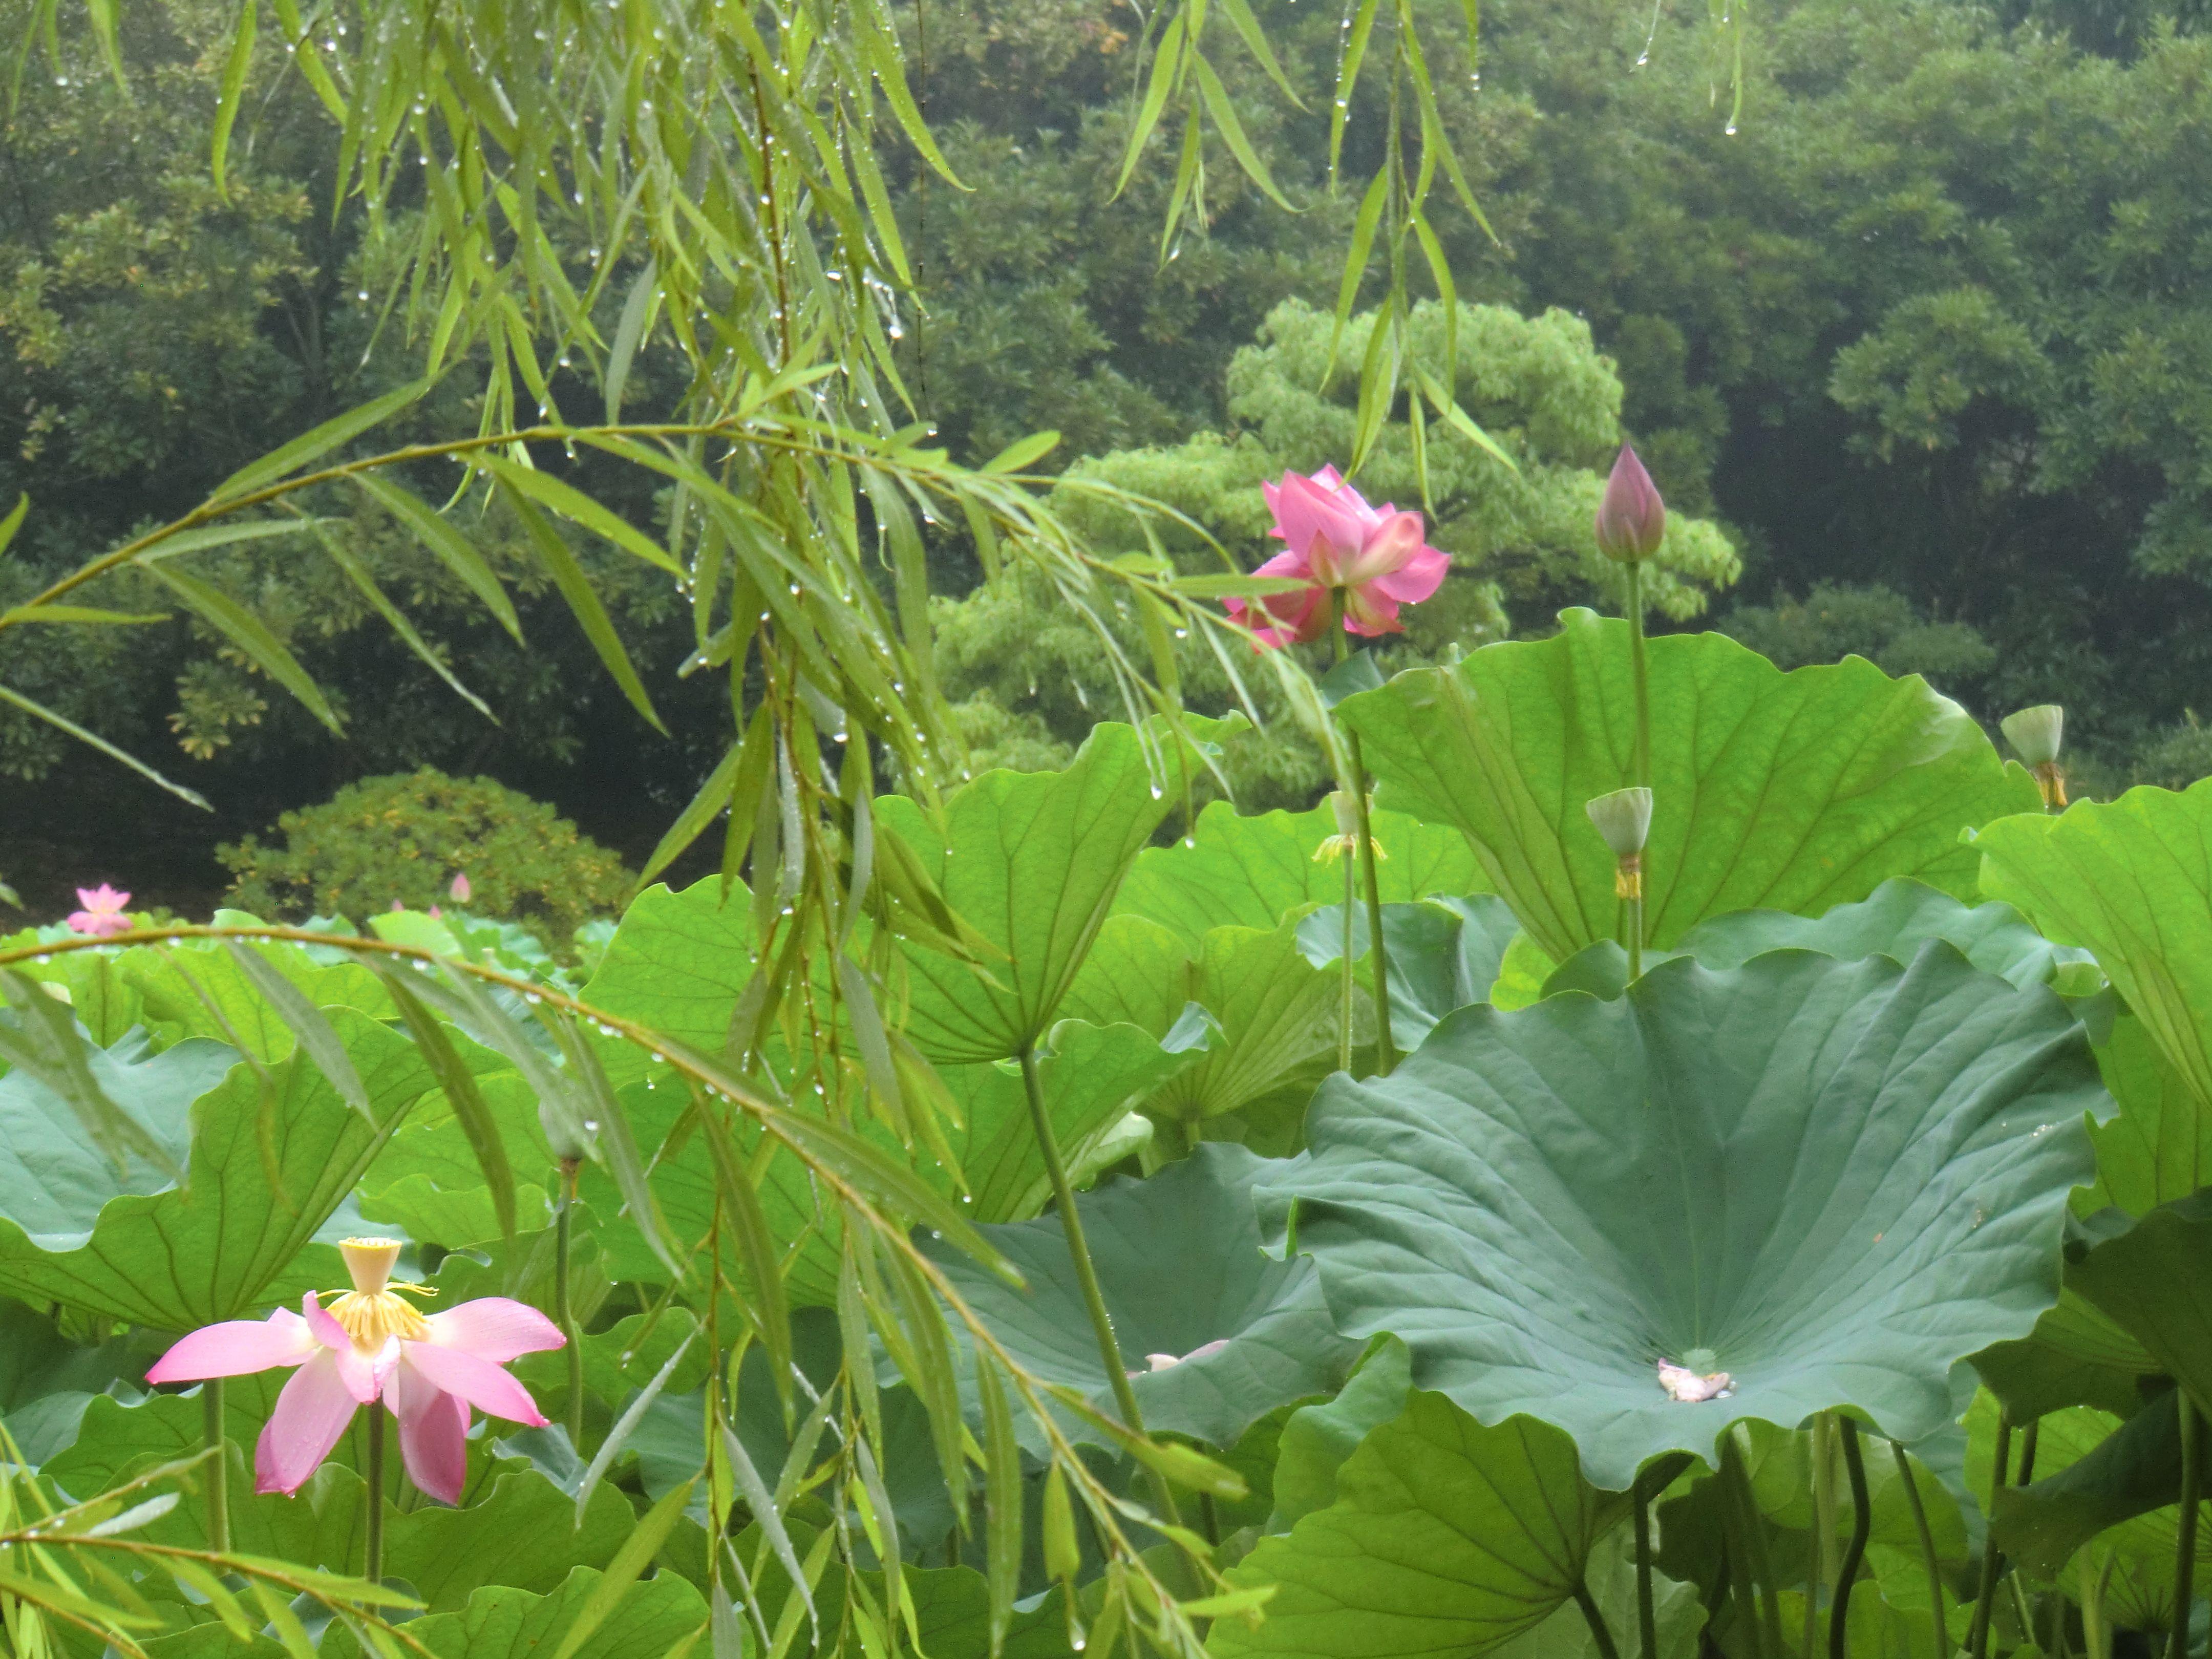 Japan Lotus Flowers Garden Yahoo Image Search Results Japanese